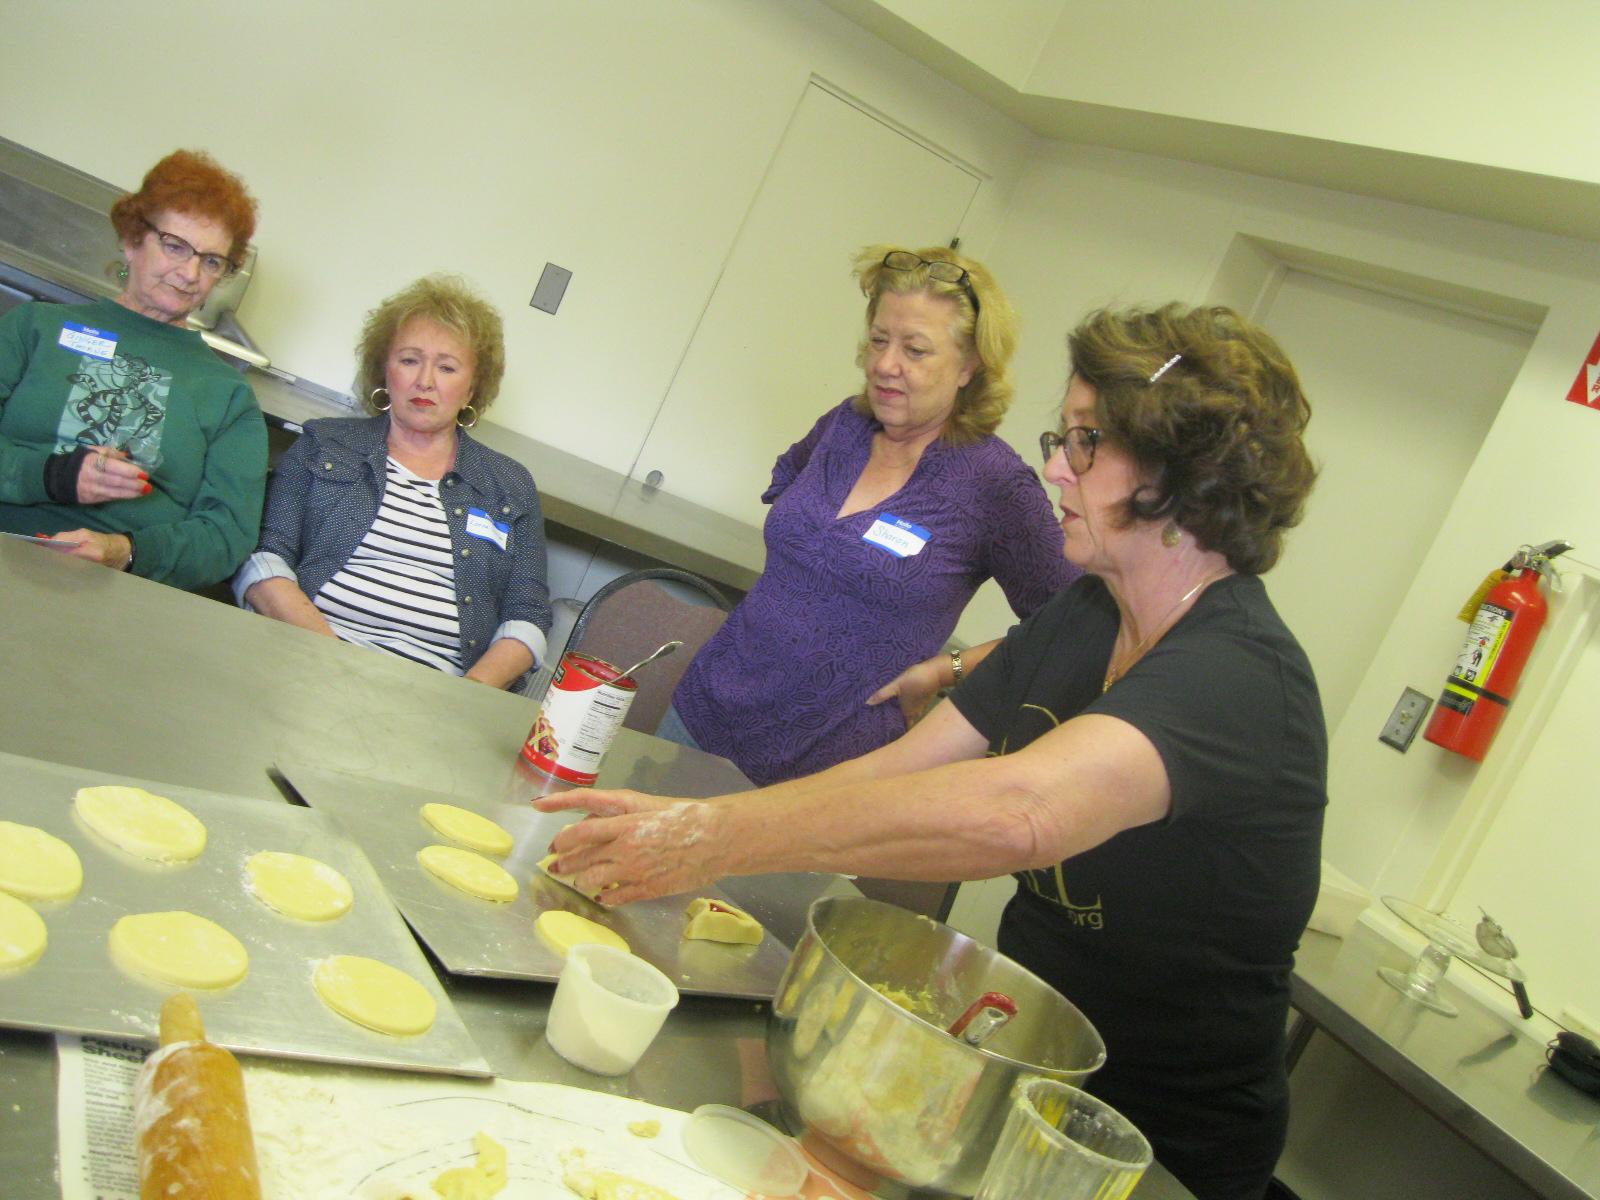 Purim Cookie Baking Demonstration 2013